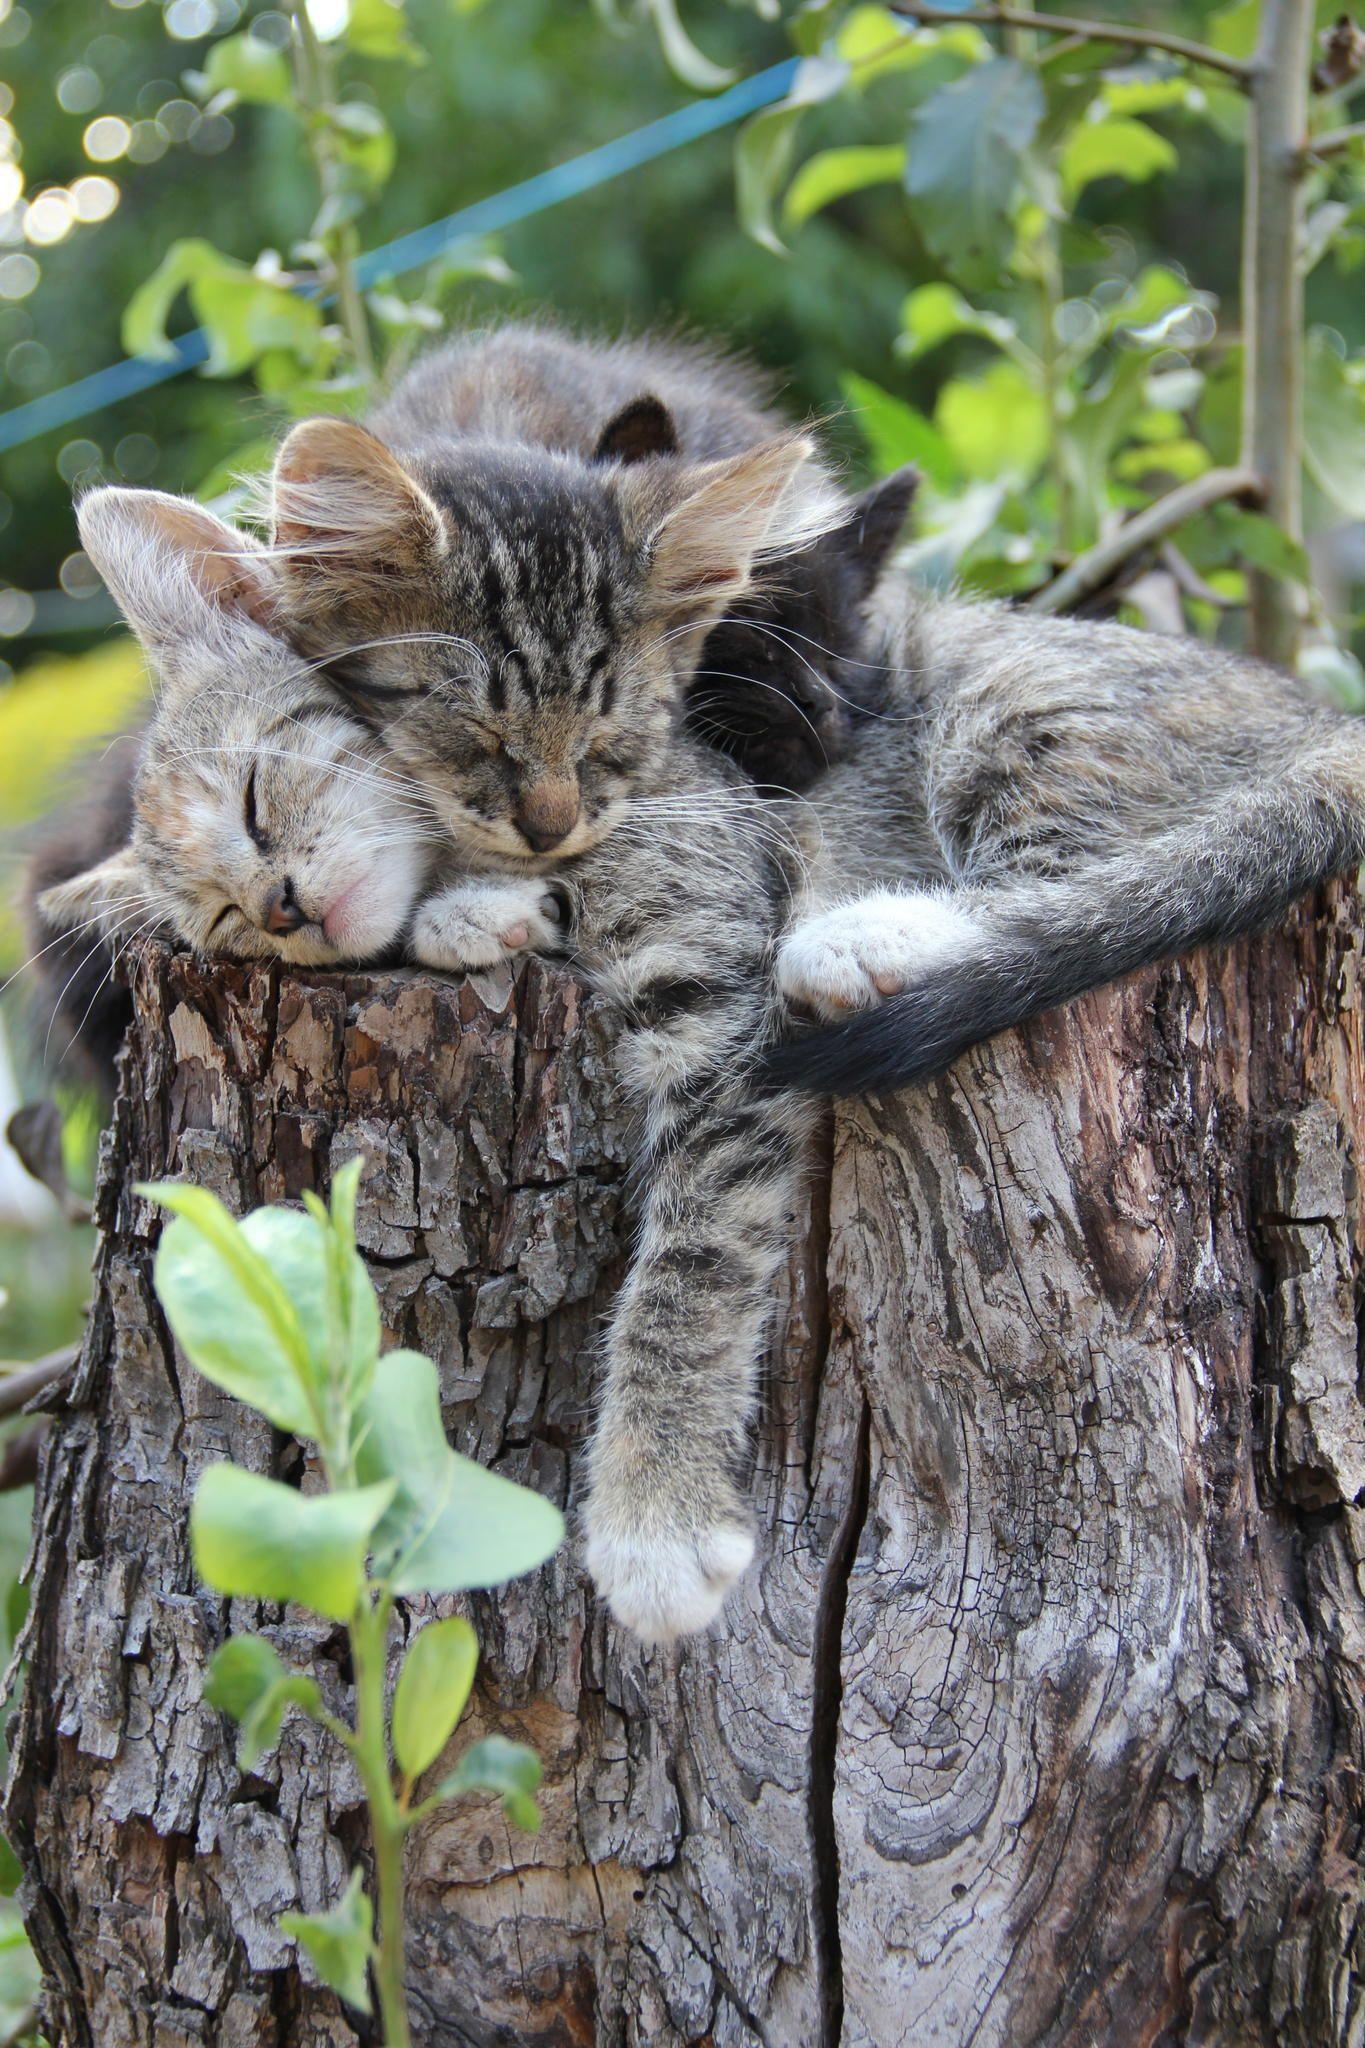 Cat Pictures To Print Bilder - Cat Pictures To Print Bilder